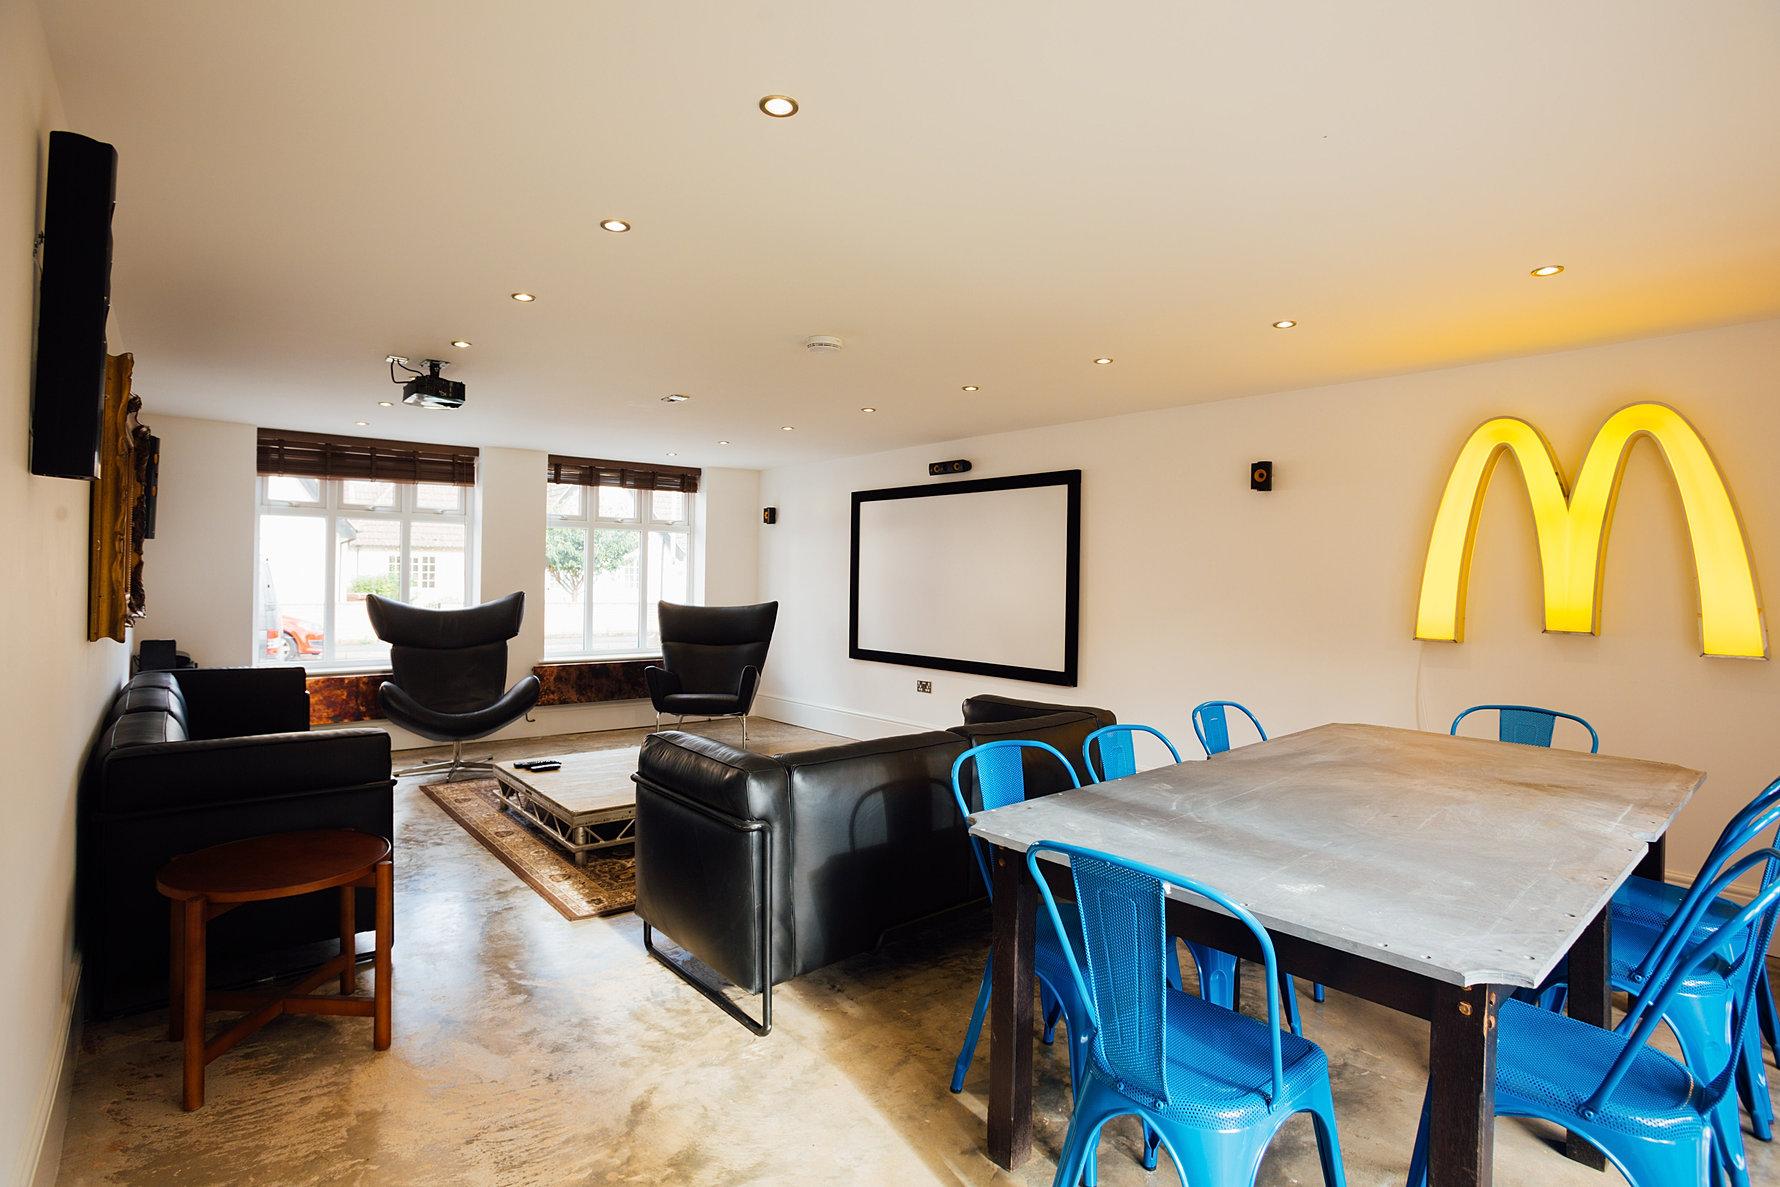 Student apartment living room - Living Room Cinema